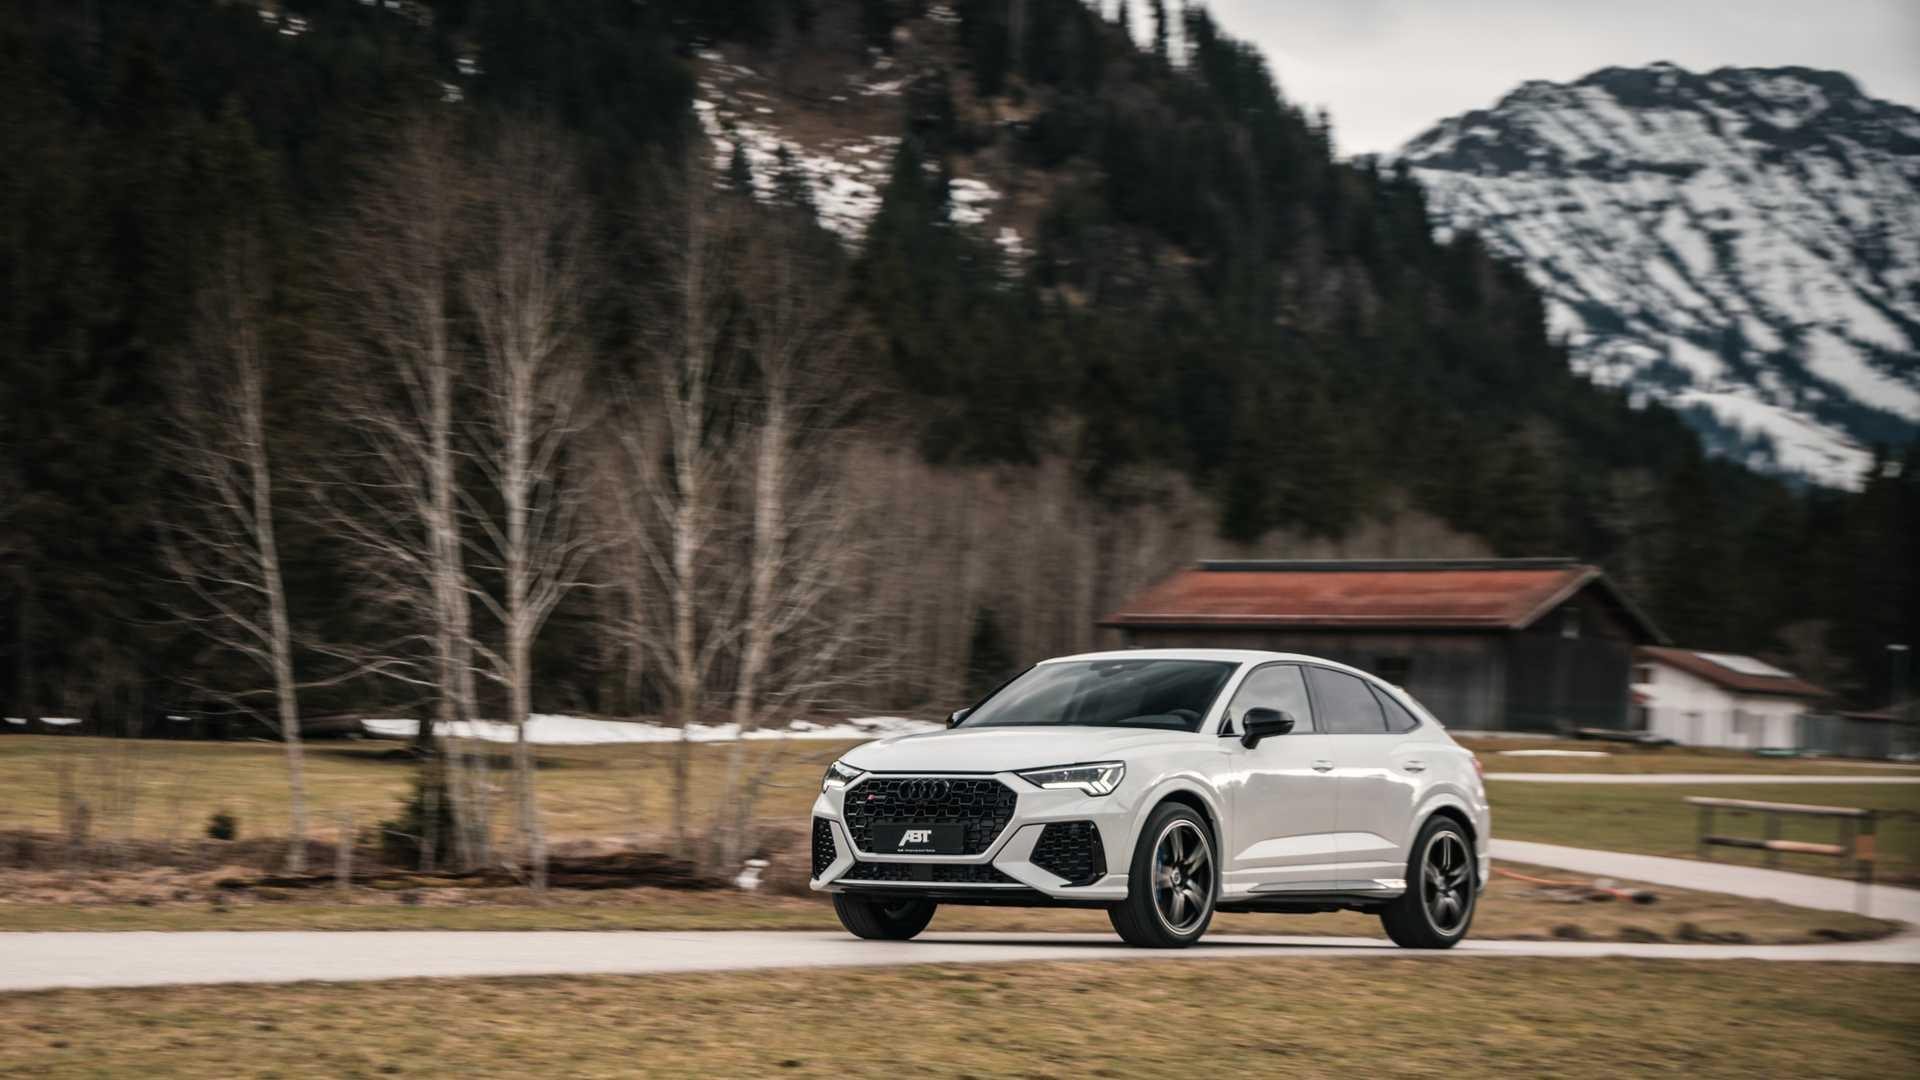 Audi-RS-Q3-Sportback-by-ABT-4